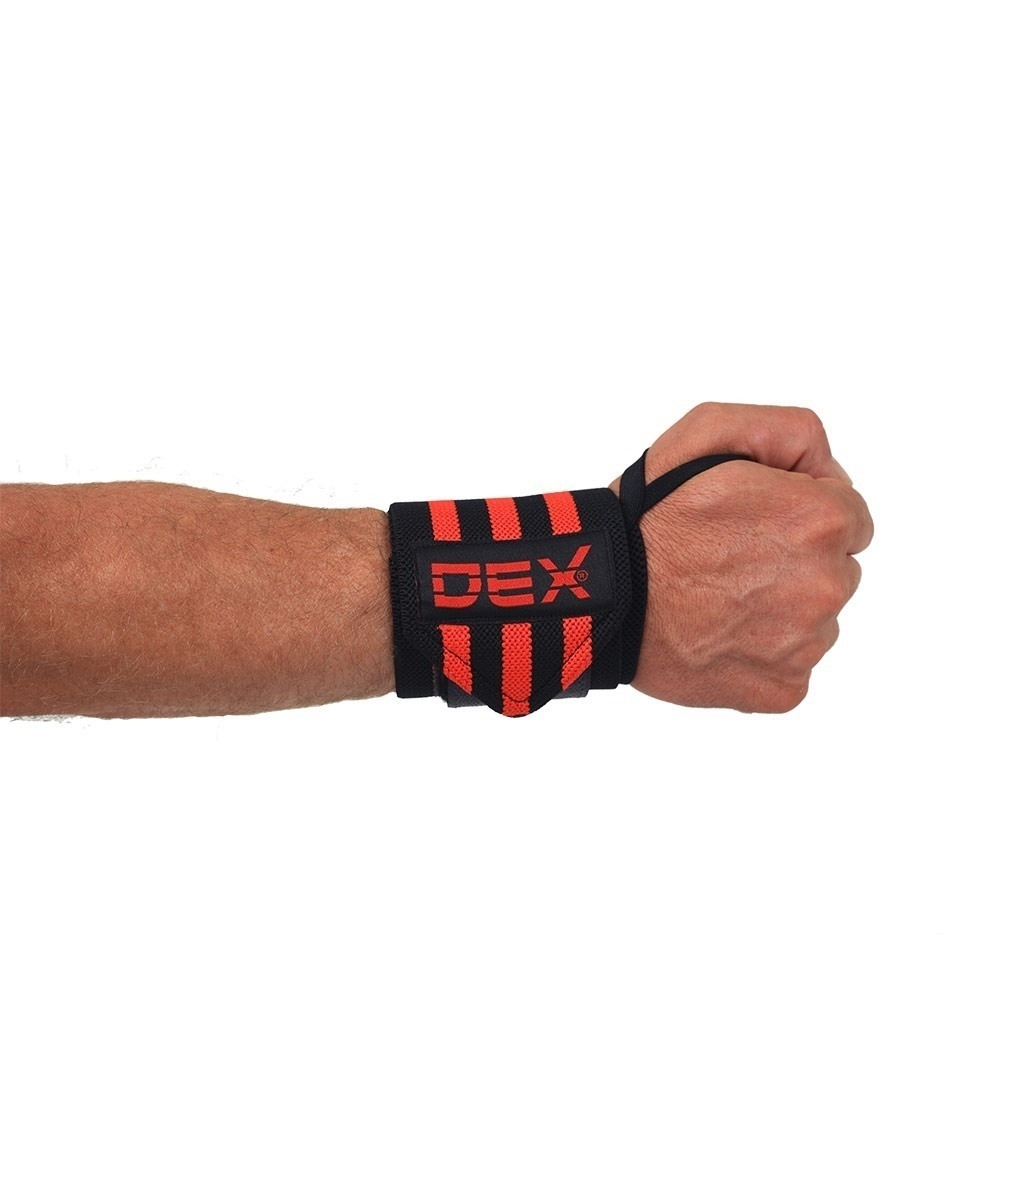 Dex Supports Wristwraps Siyah Kırmızı